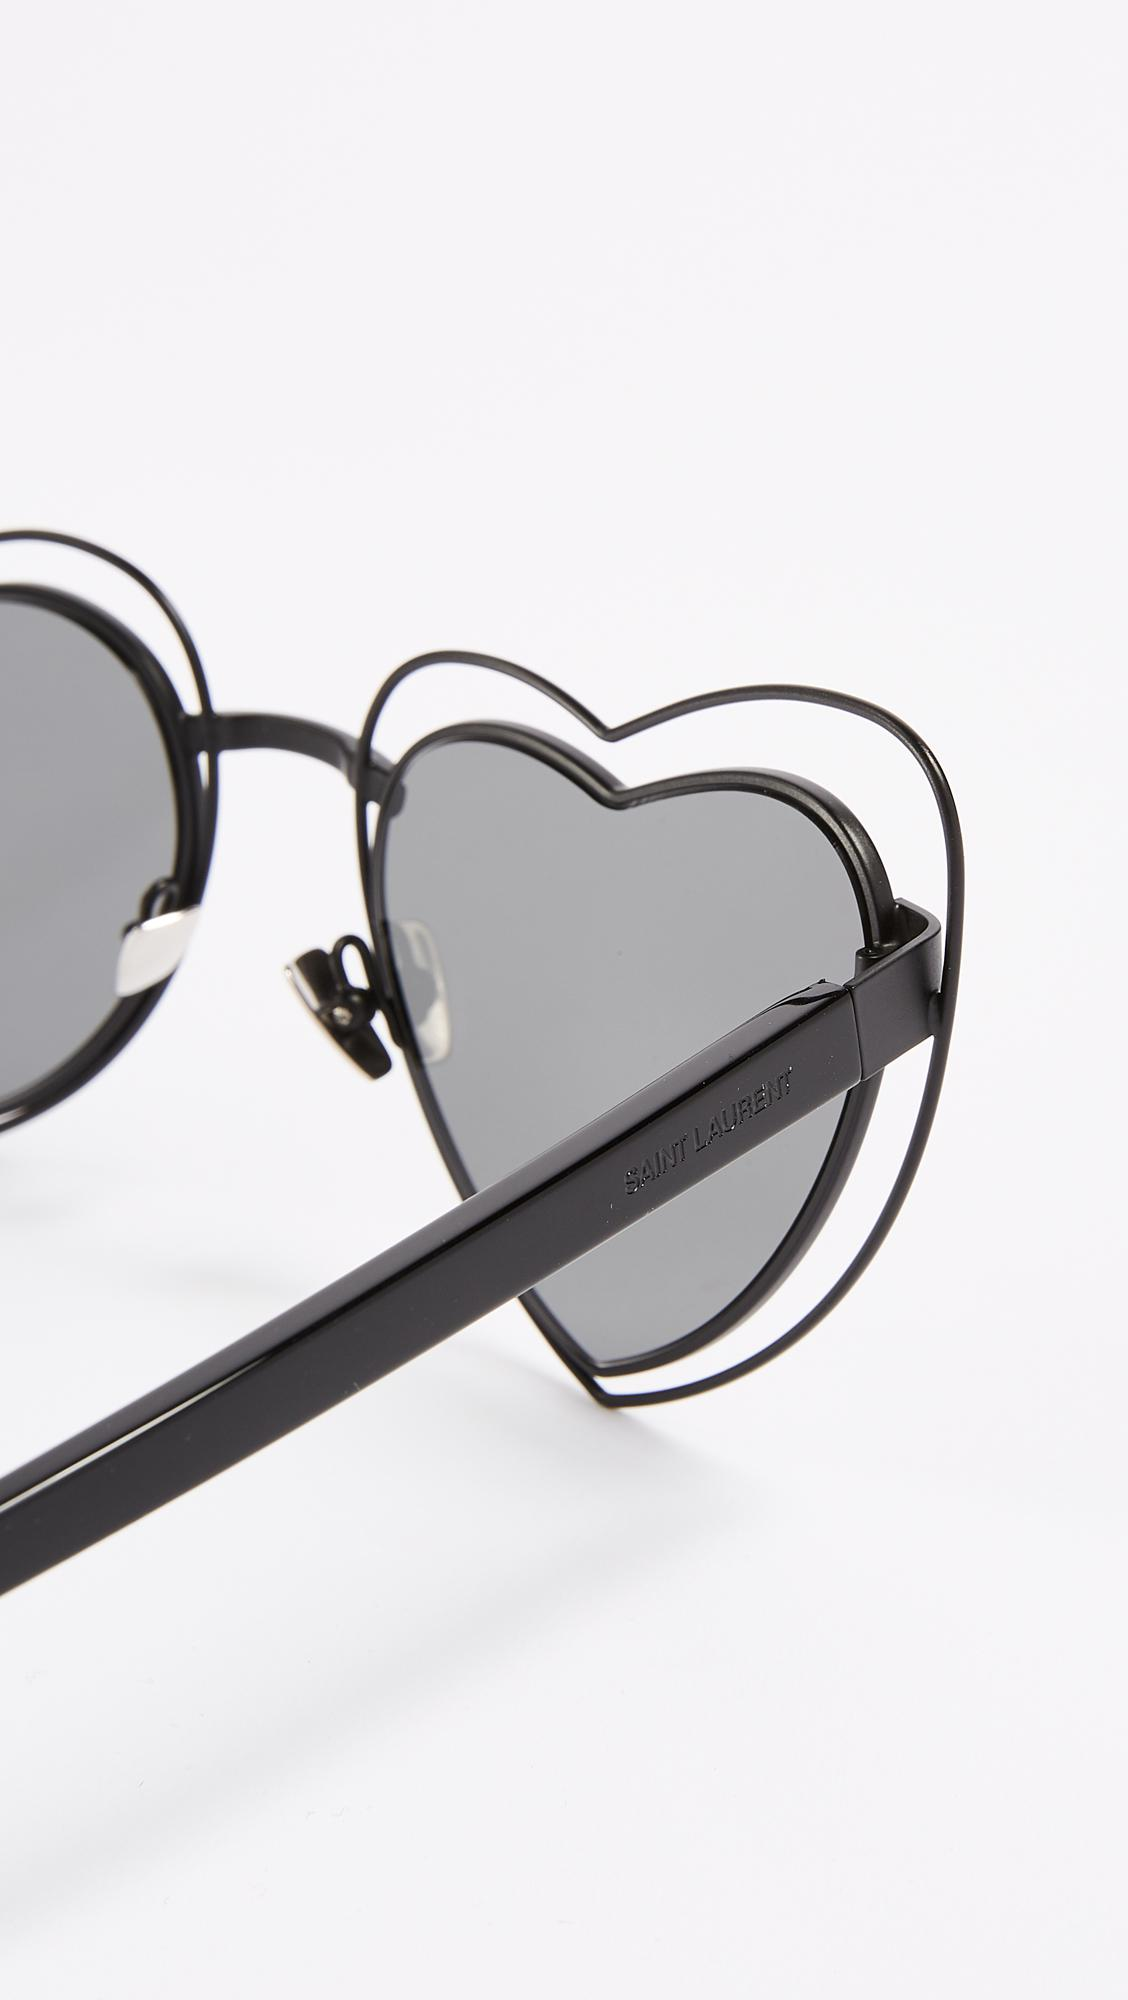 976f25d4774a8 Lyst - Saint Laurent Lou Lou Hearts Sunglasses